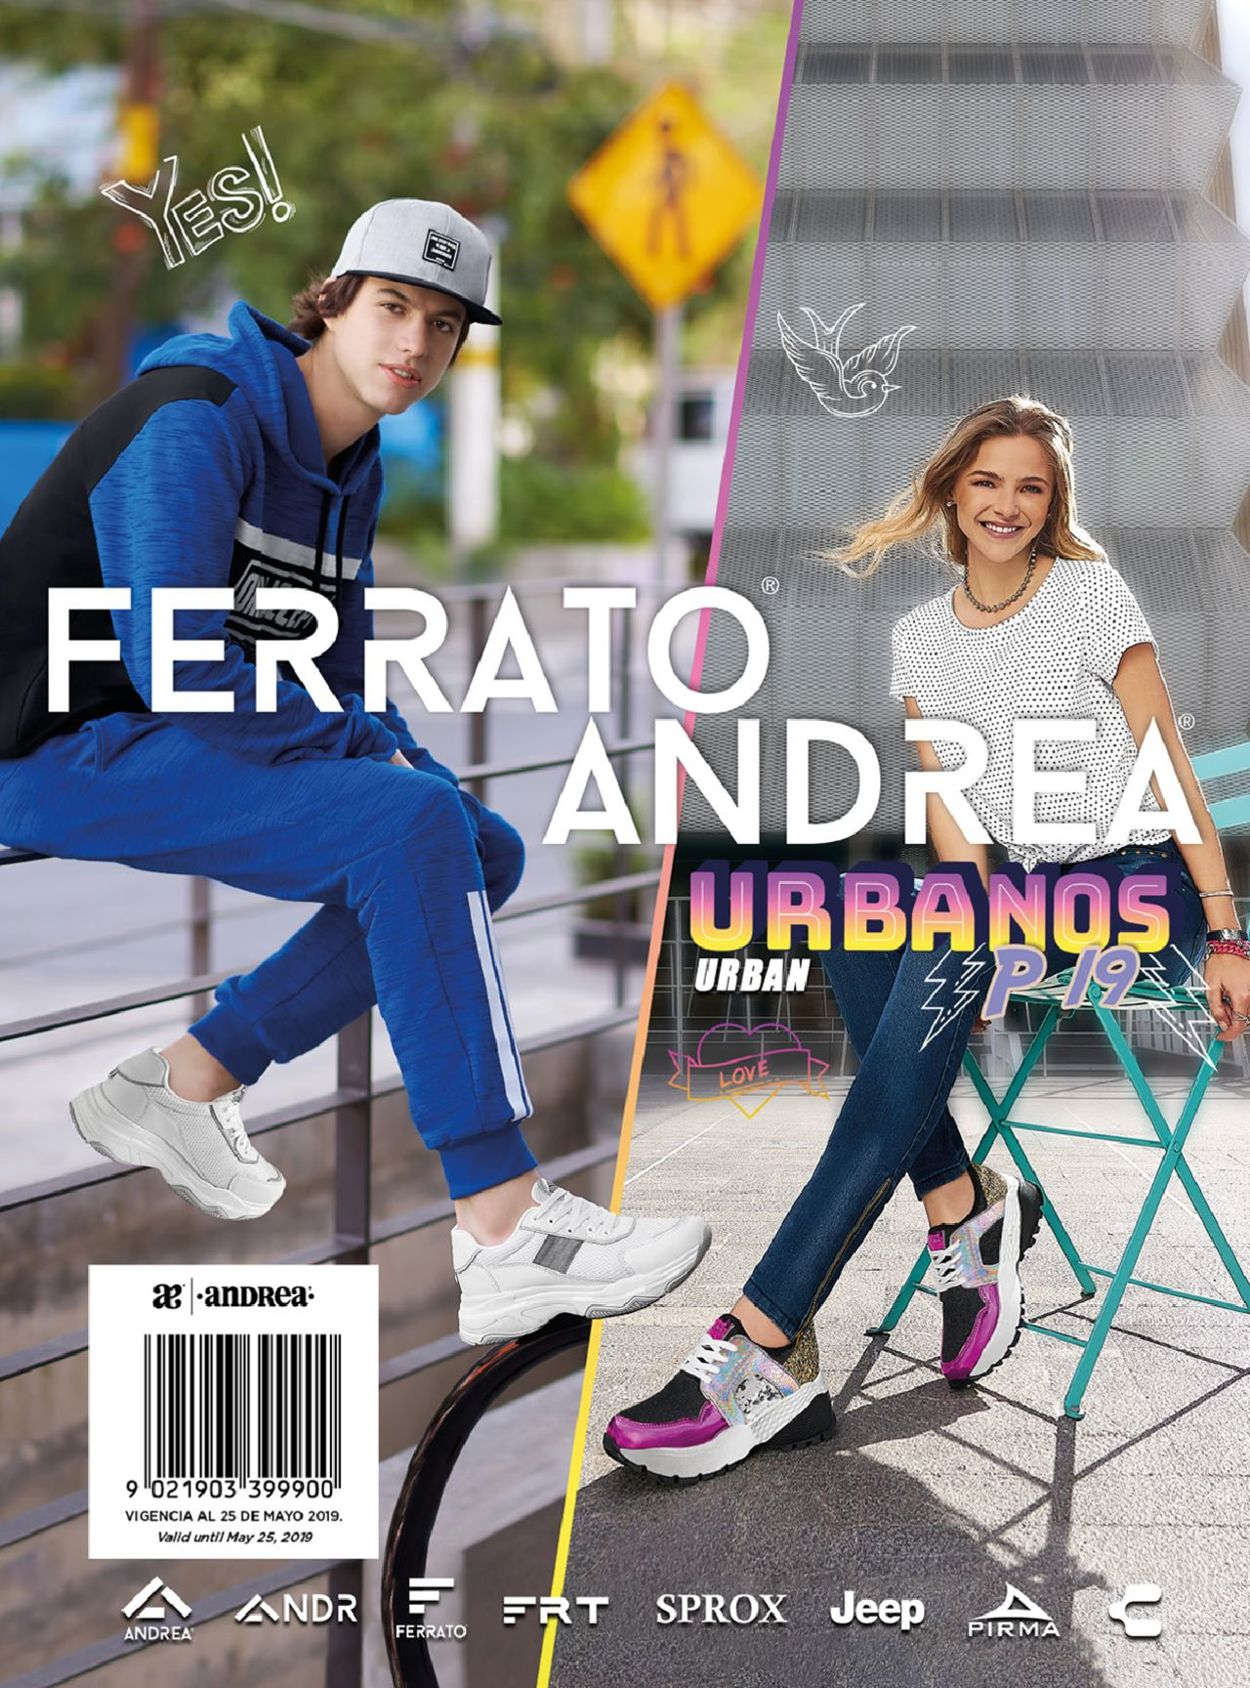 Andrea Folleto - 01.04-25.05.2019